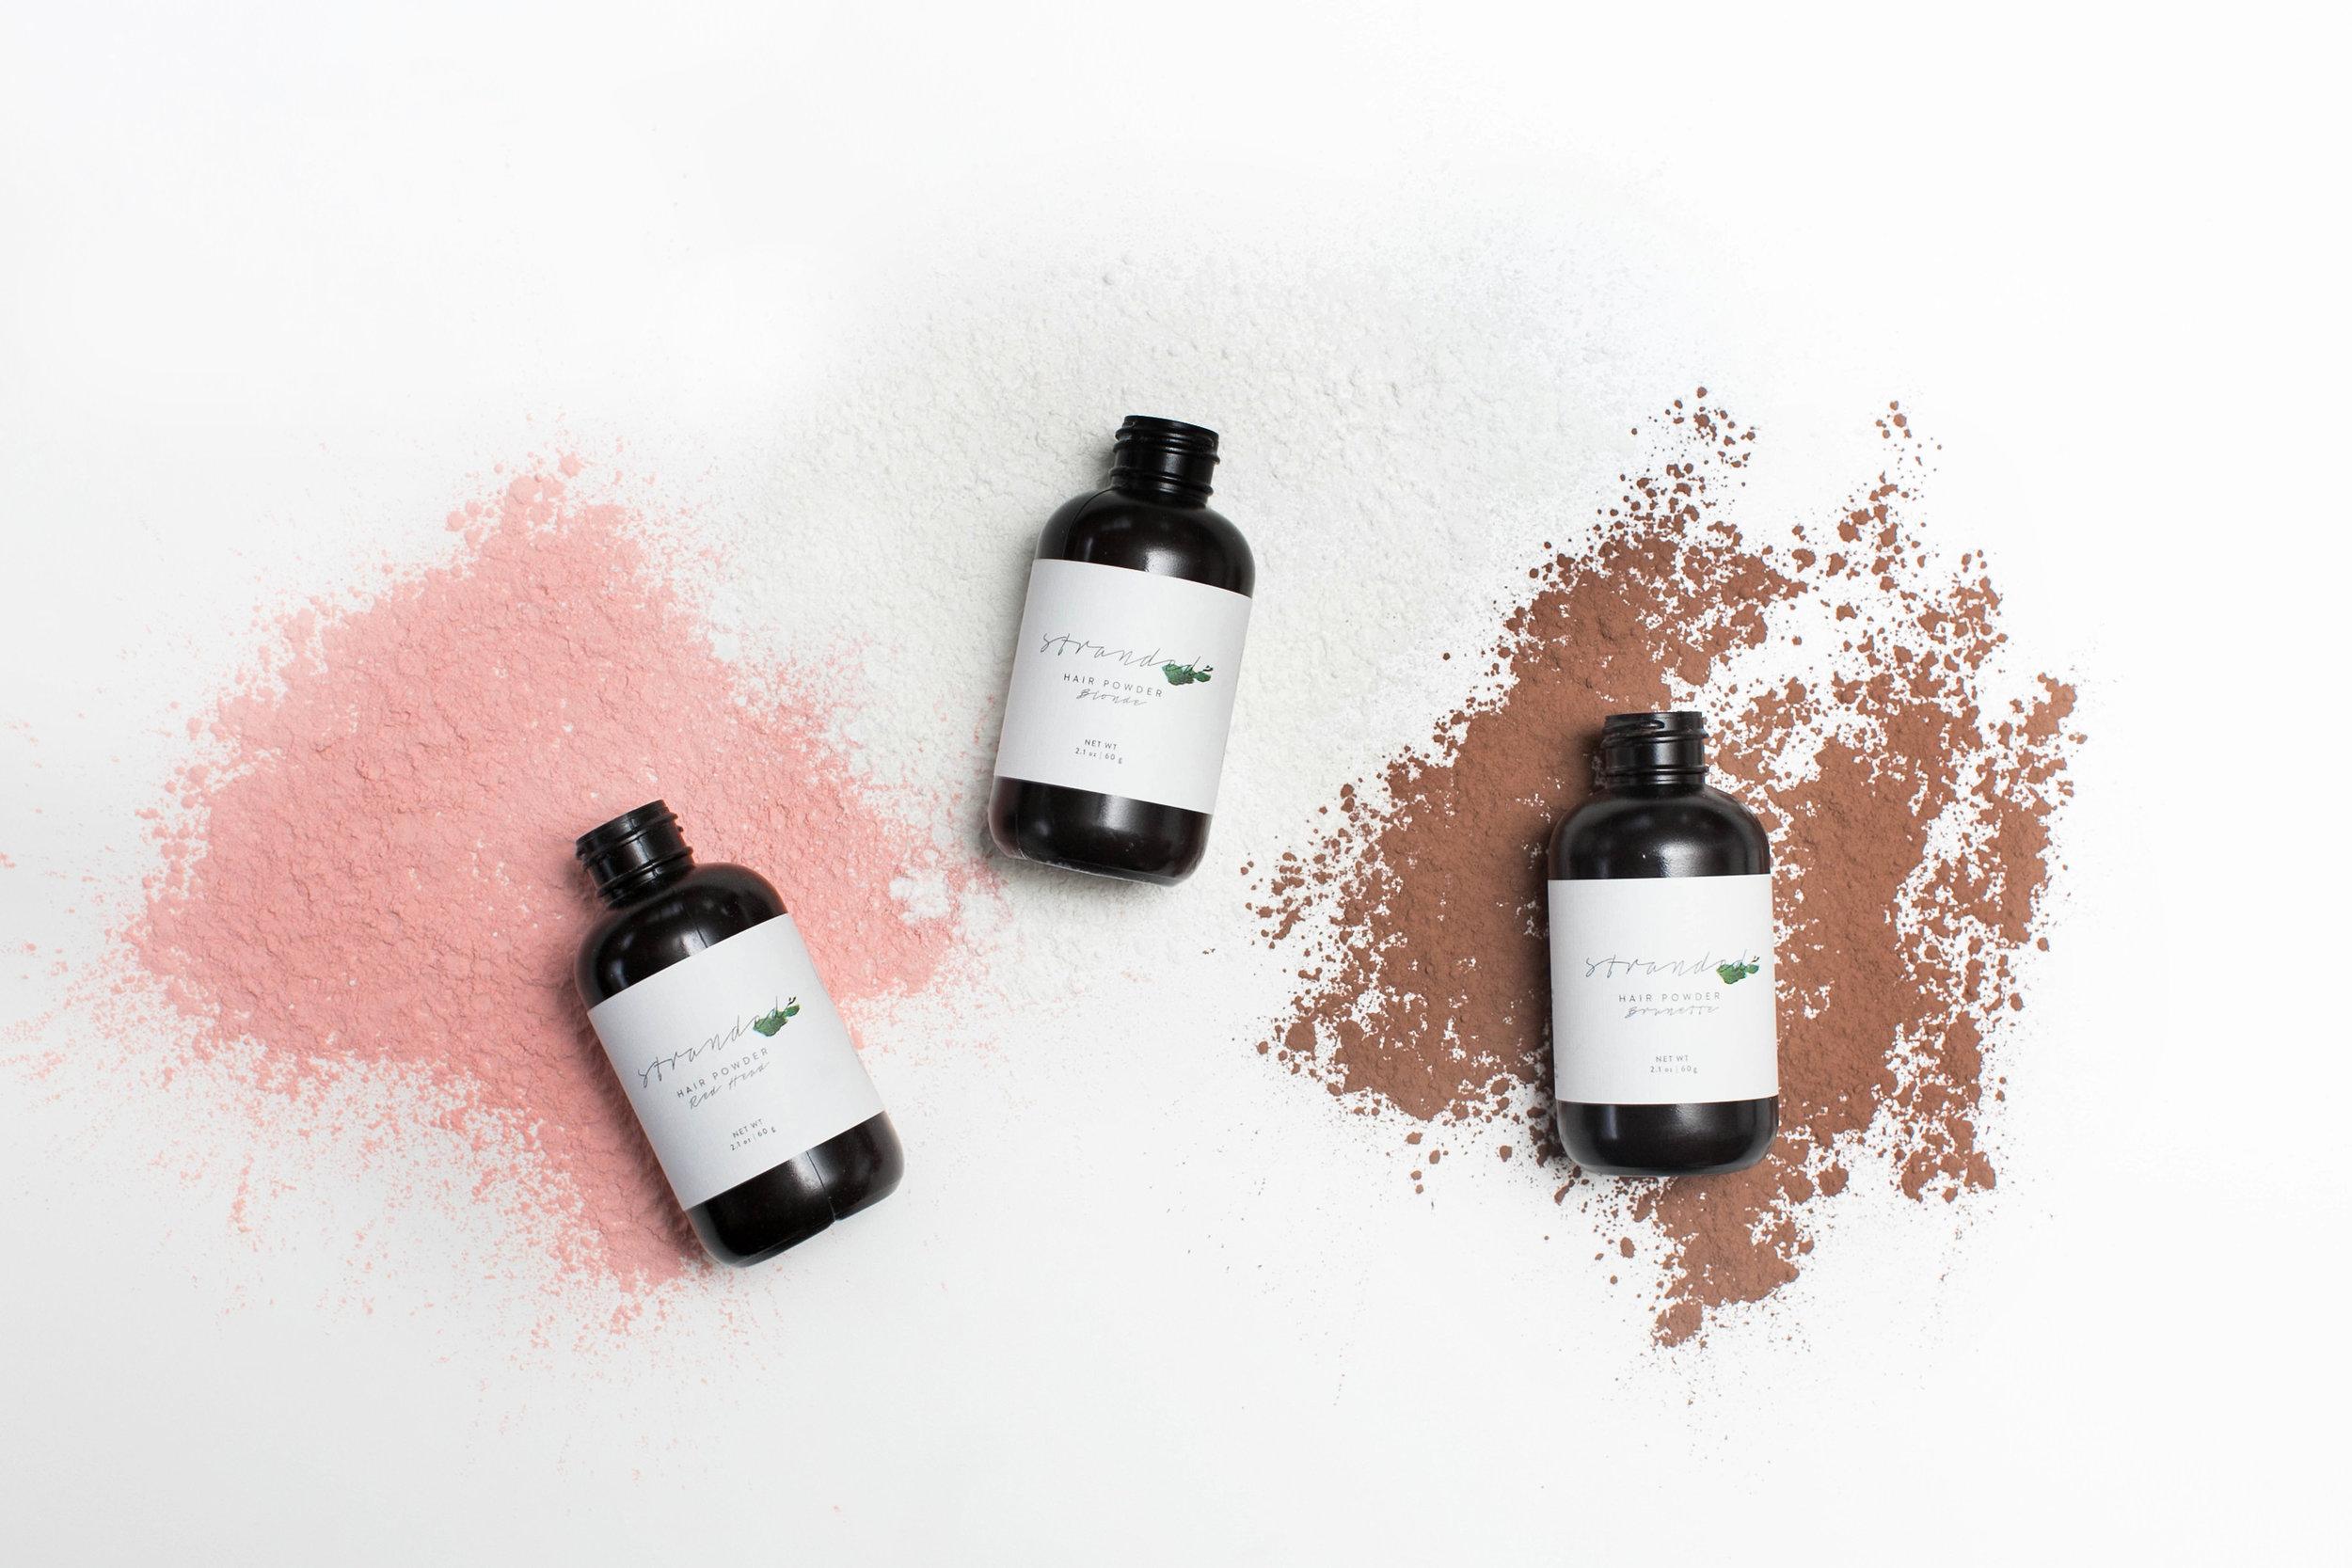 Stranded Dry Shampoo by Lauren Scruggs Kennedy